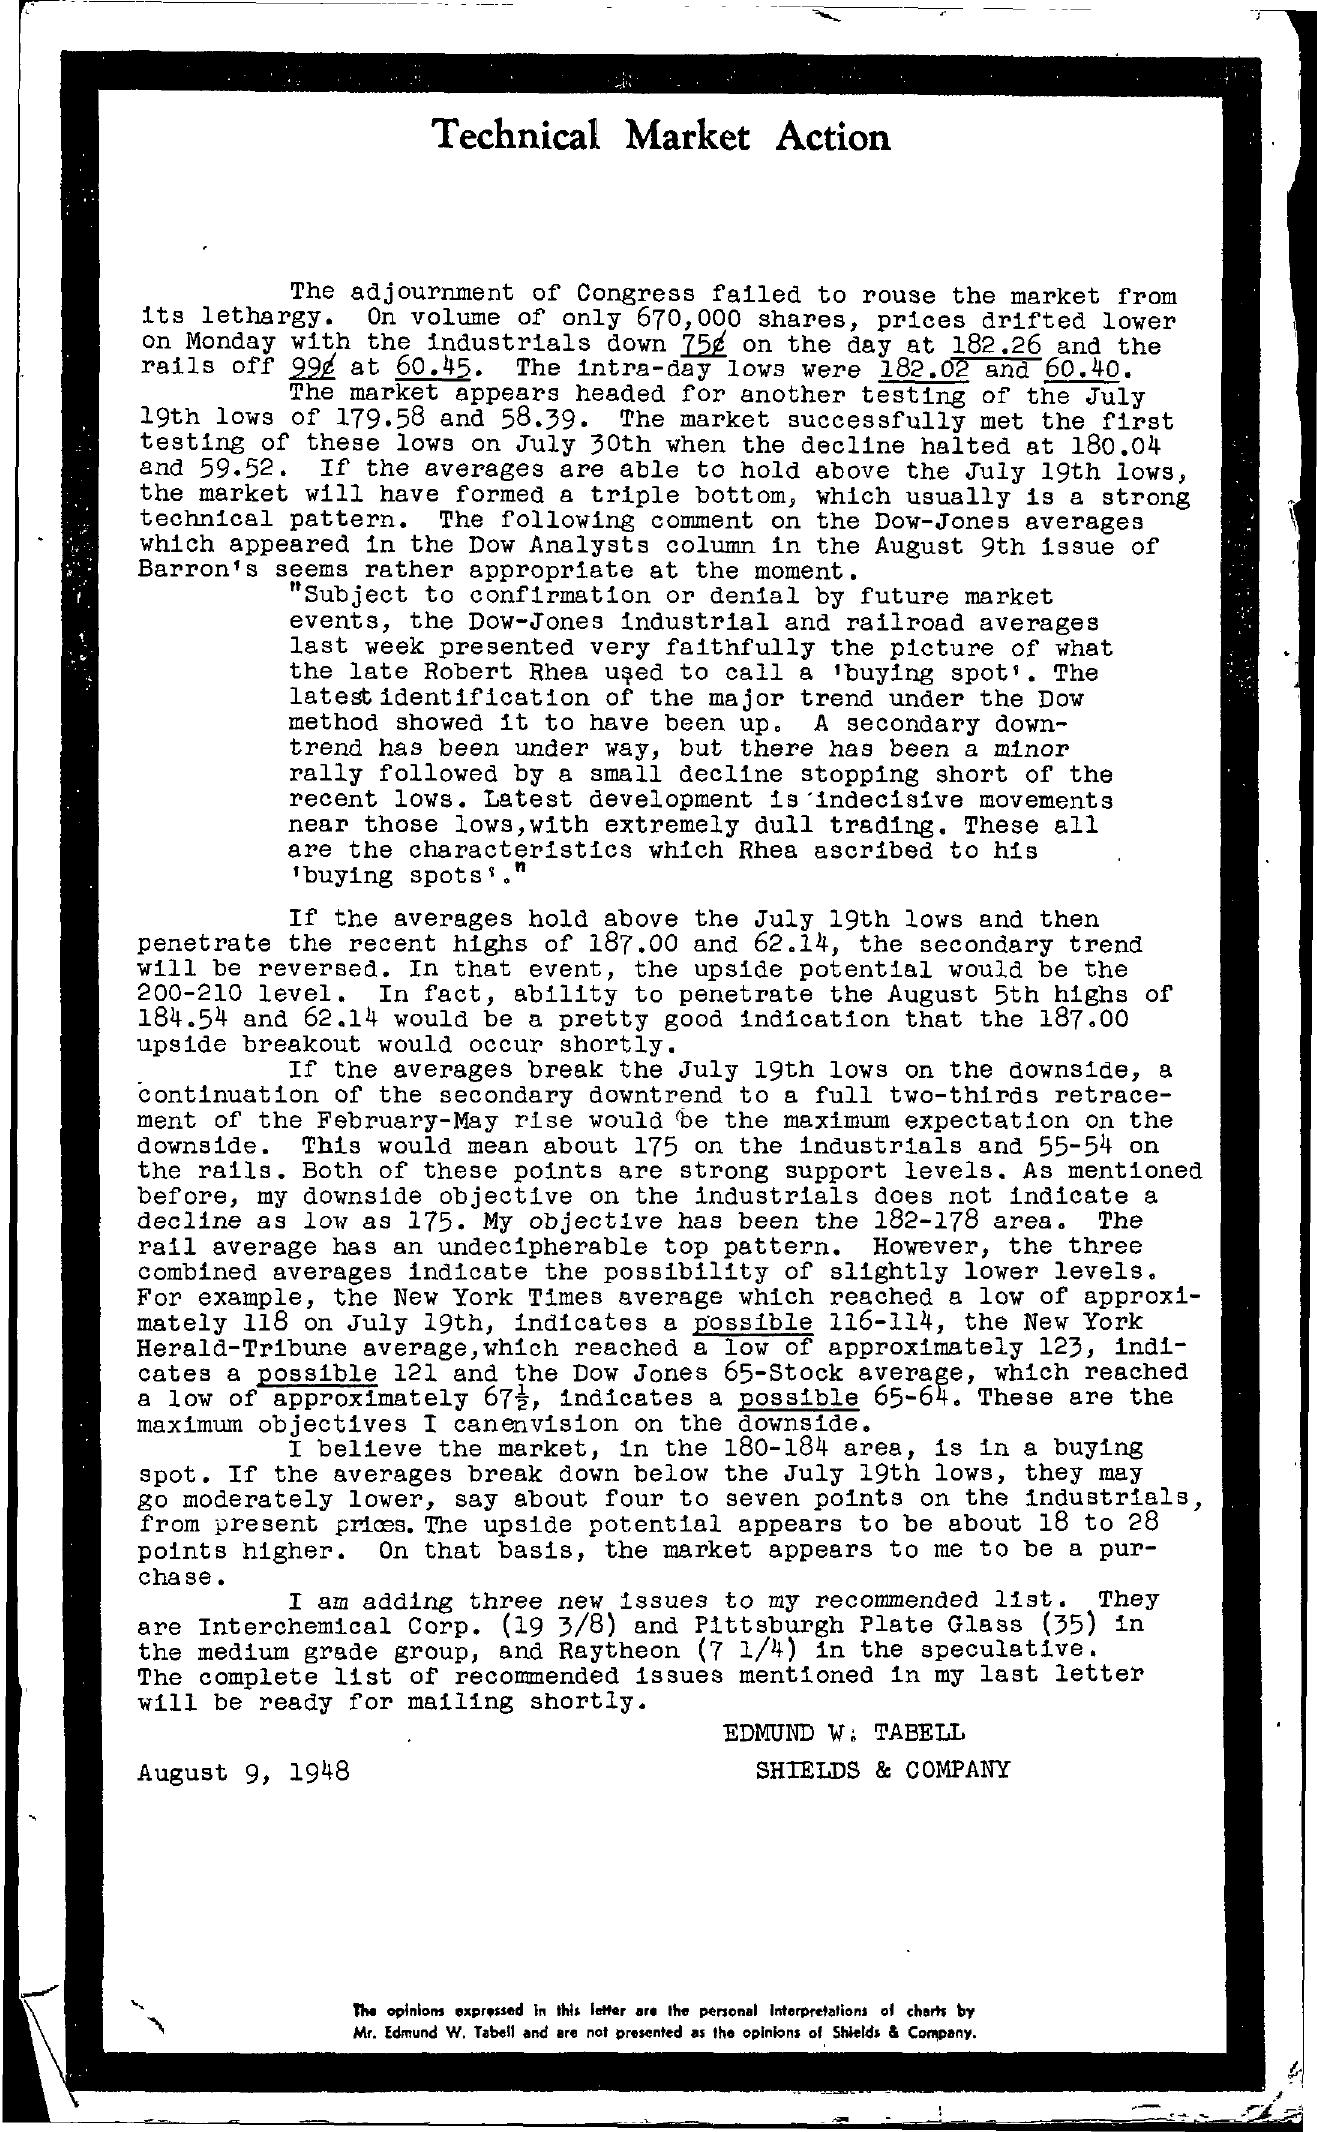 Tabell's Market Letter - August 09, 1948